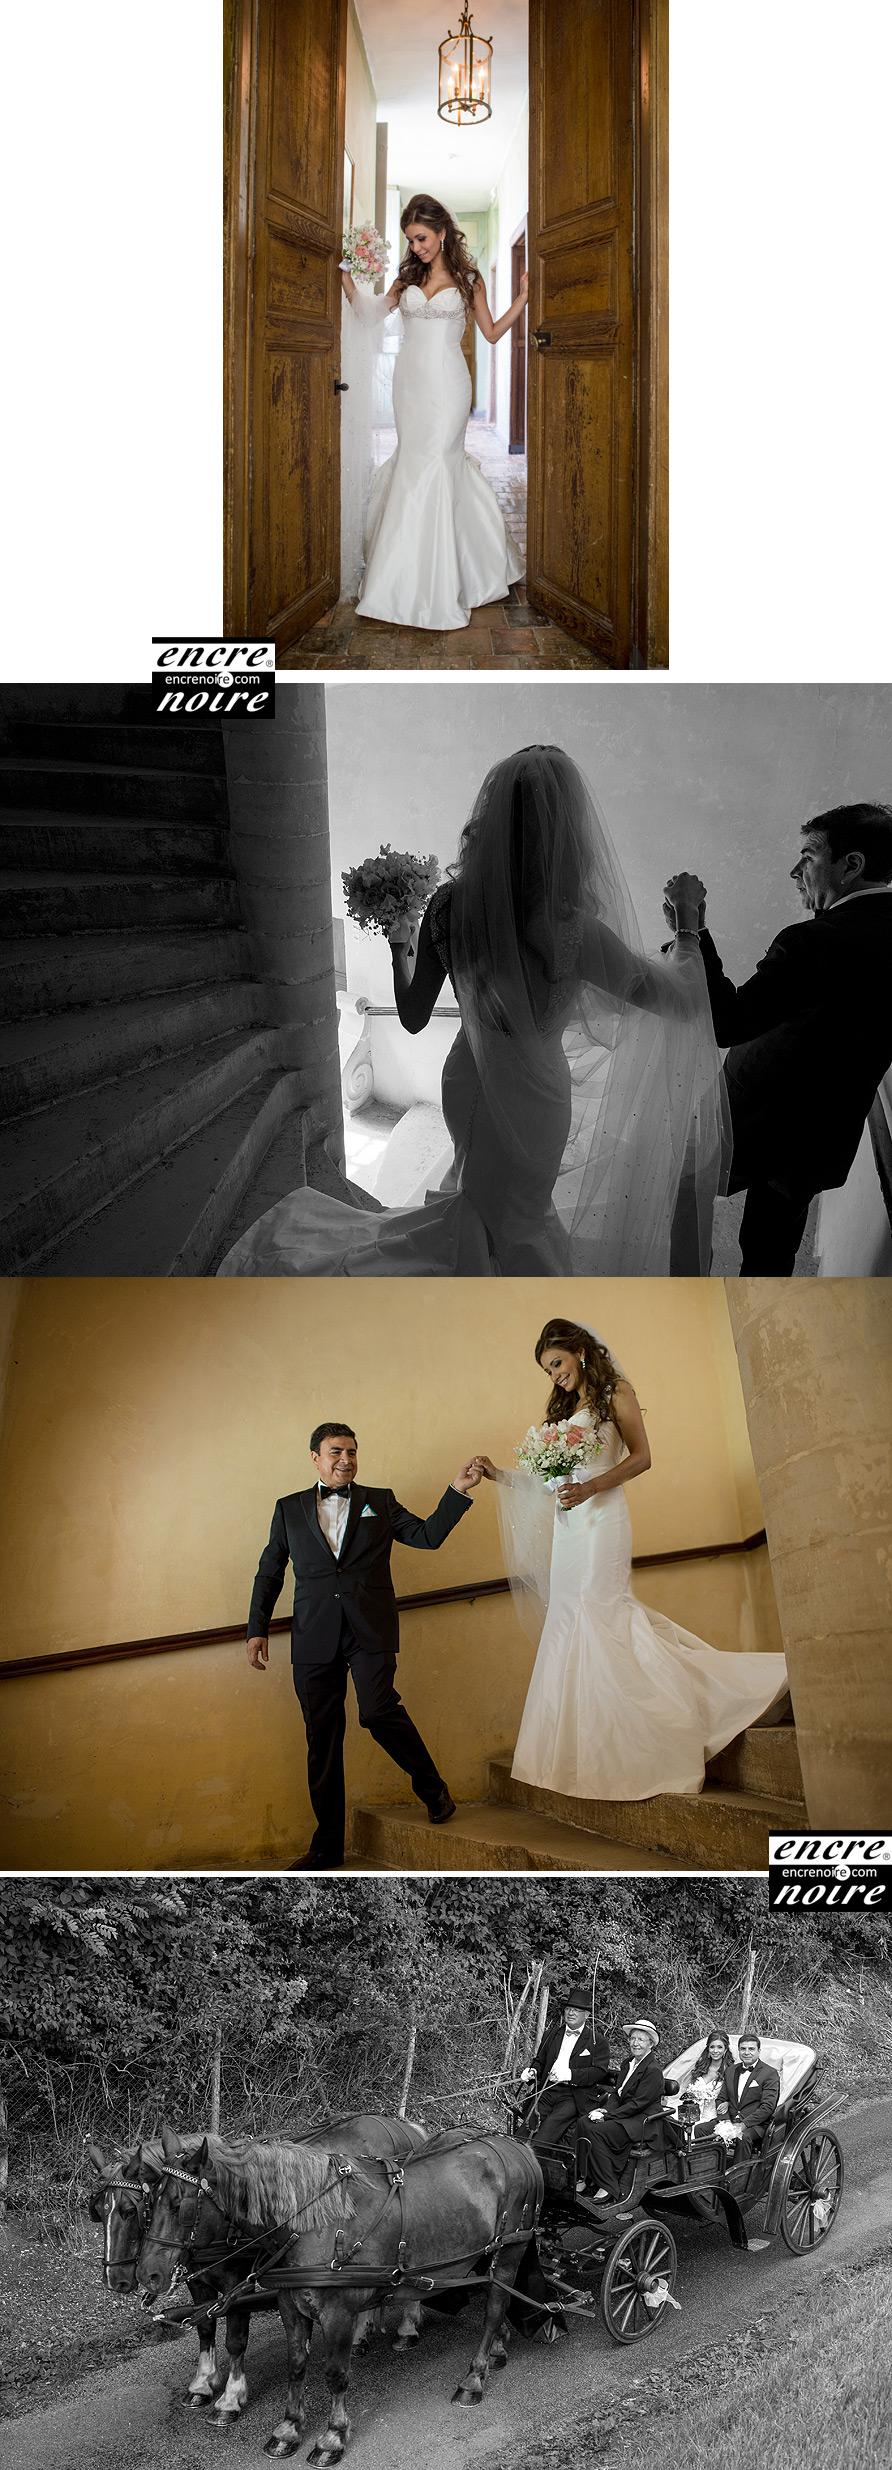 photographe-mariage-chateau-de-vallery-20